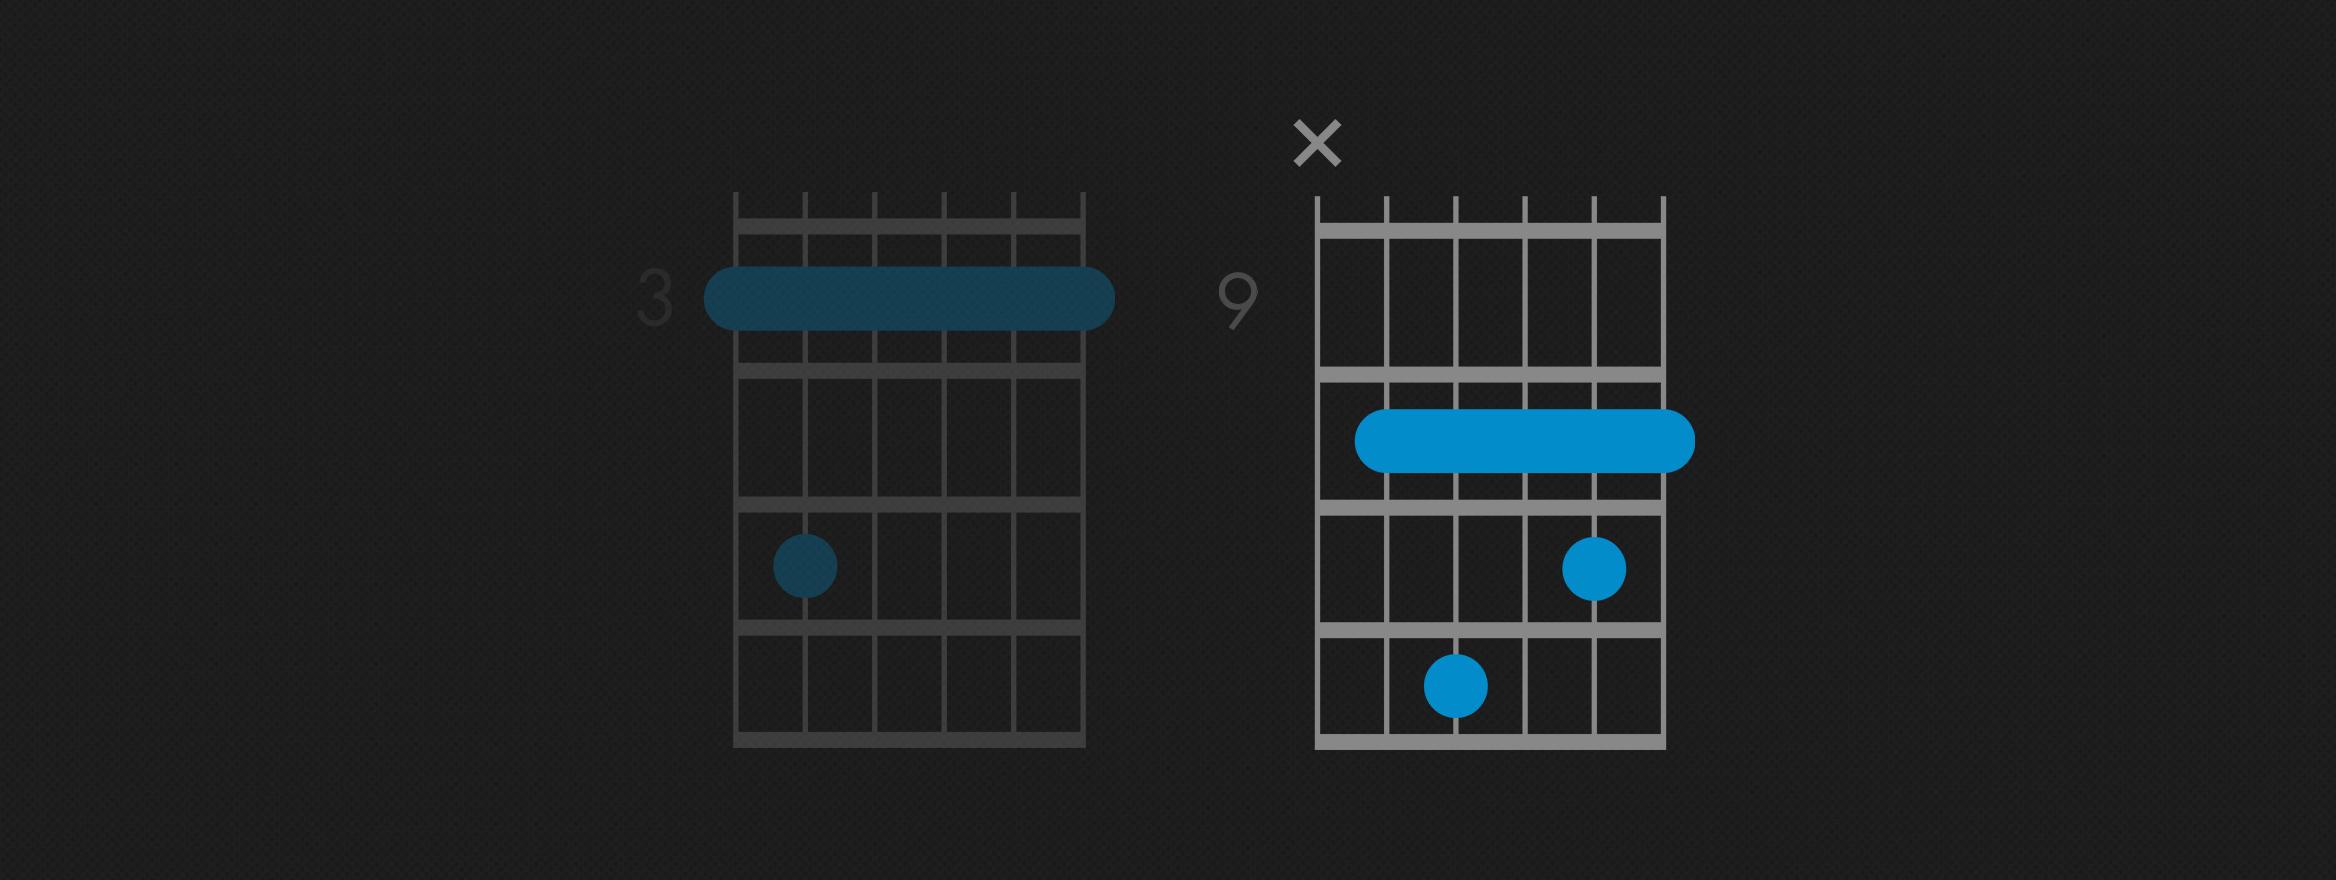 Gm15 Chord   How to Play Gm15 Guitar Chord   G minor 15   Fender Play